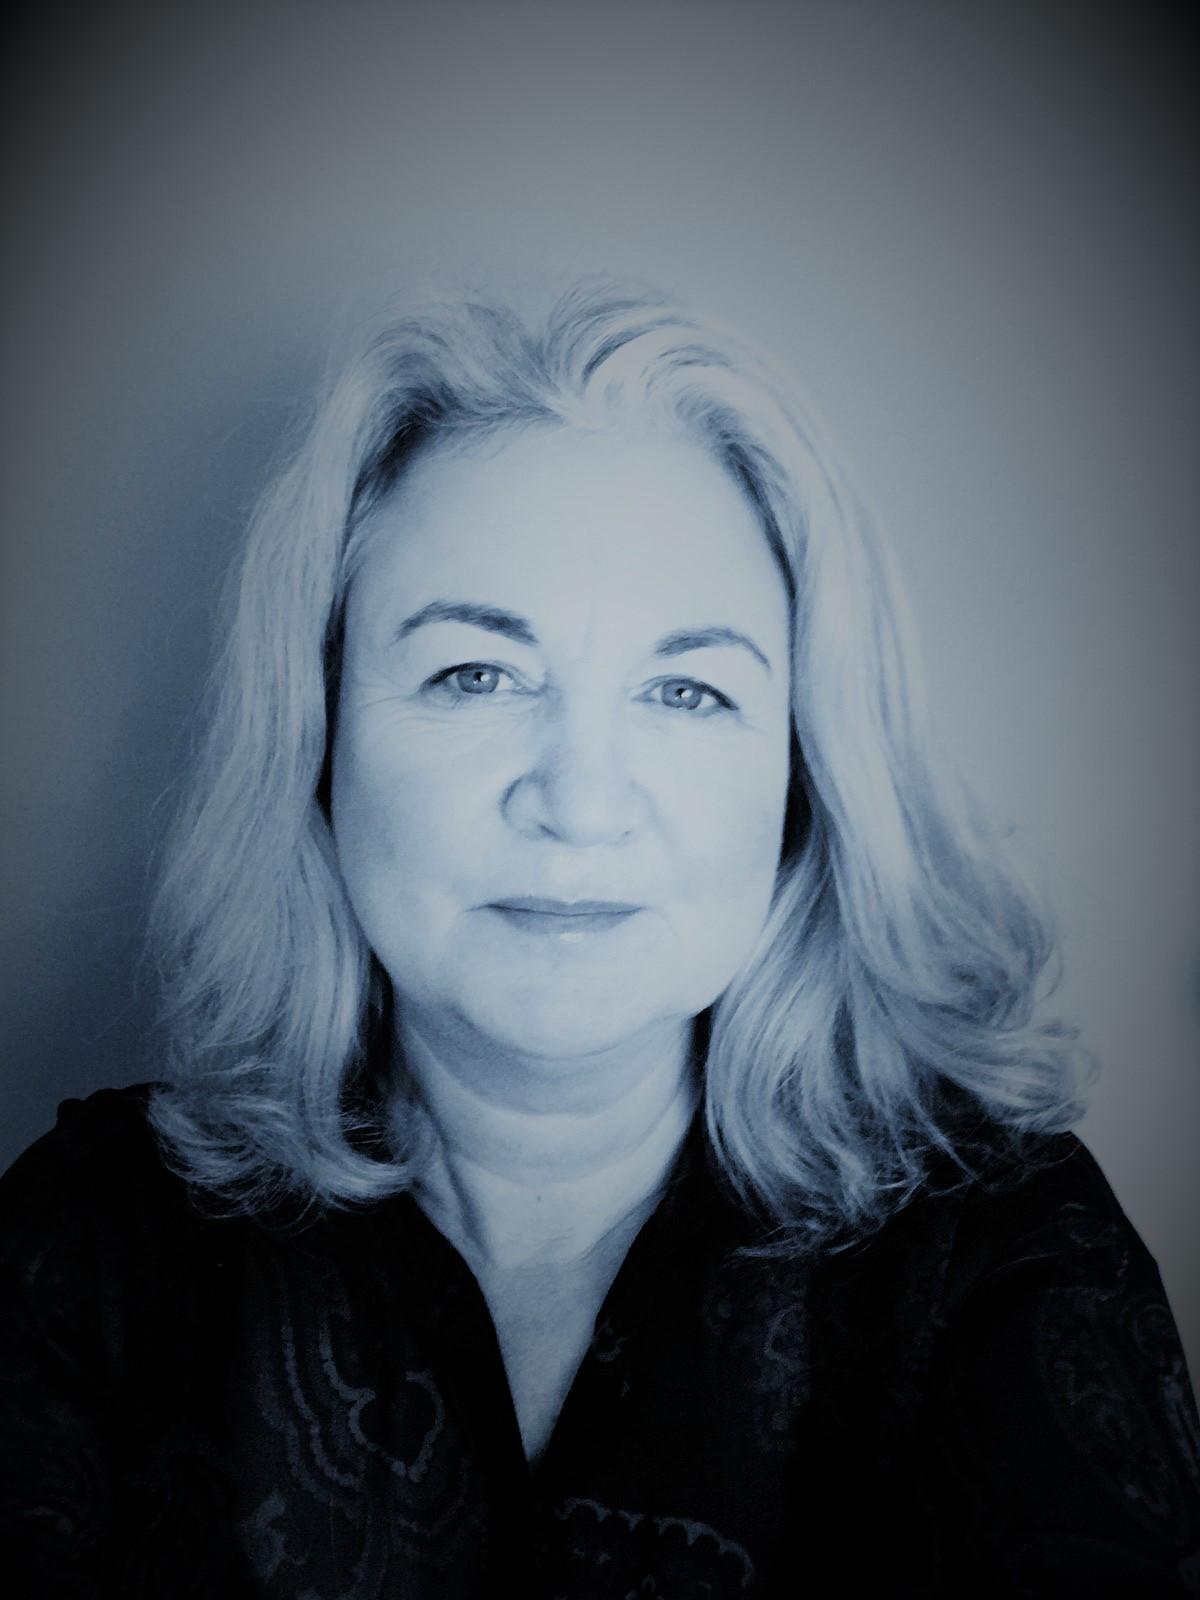 Theresa Merrigan